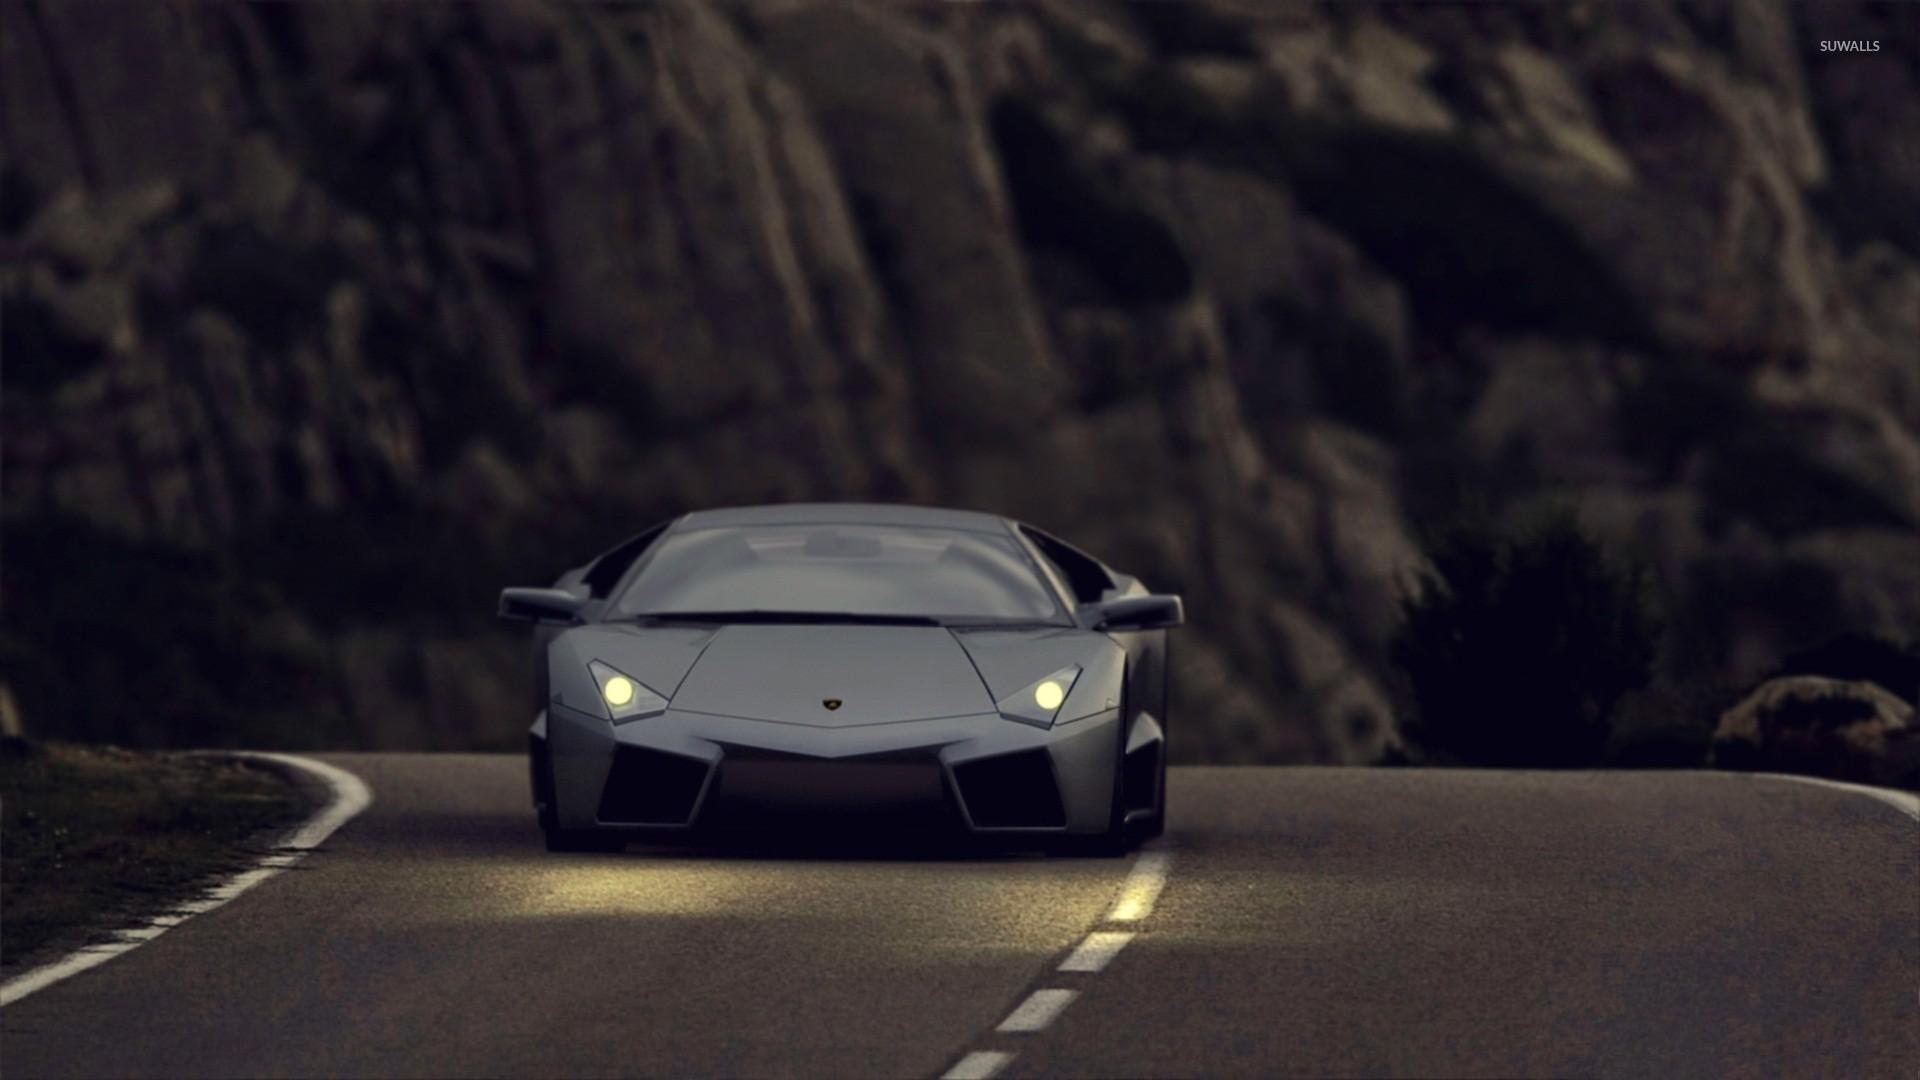 Lamborghini Reventon 2 Wallpaper Car Wallpapers 26860